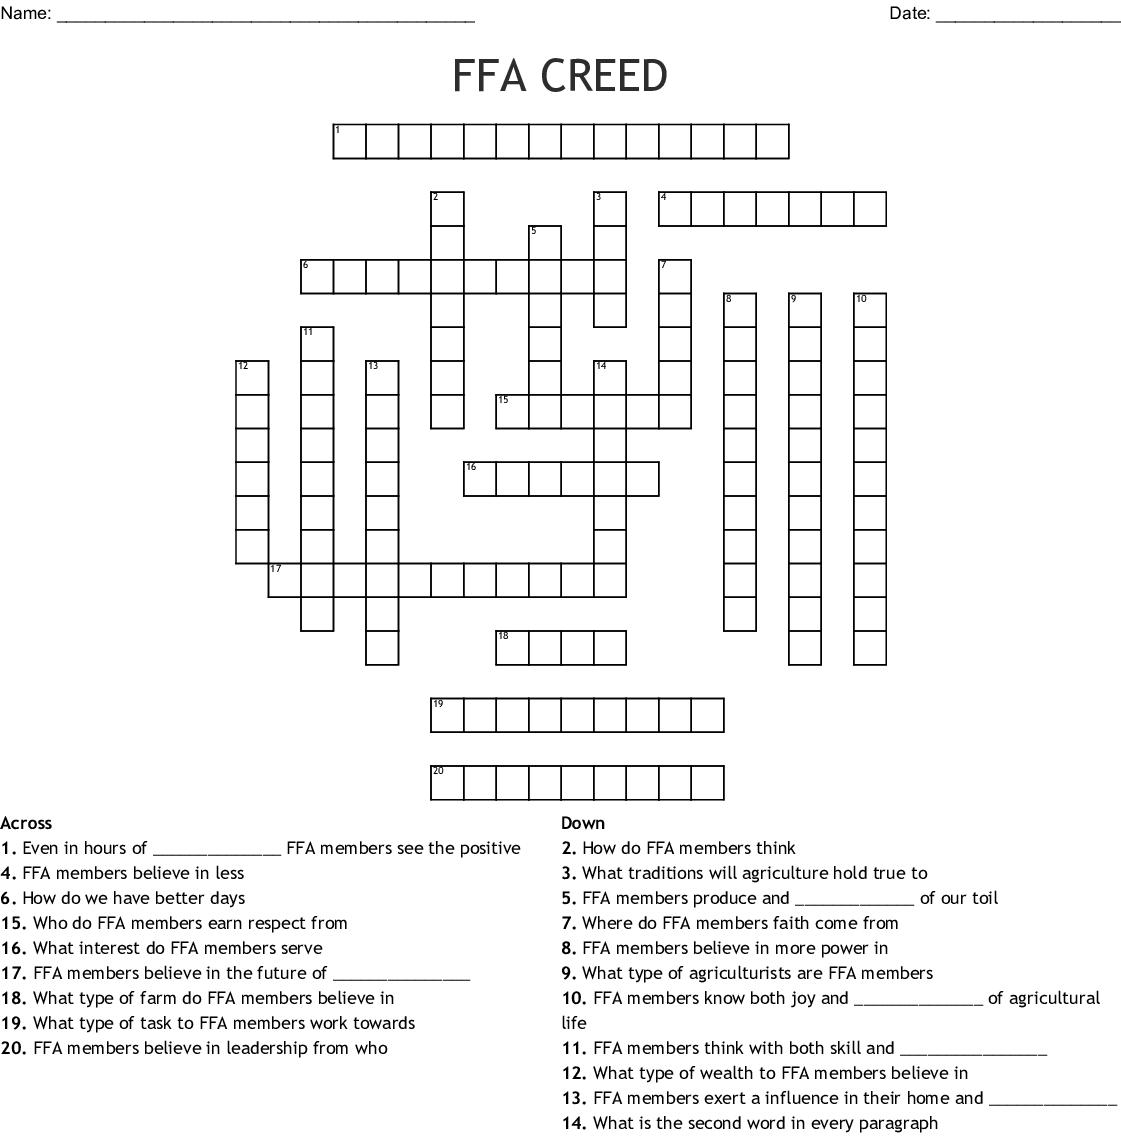 The Creed Crossword